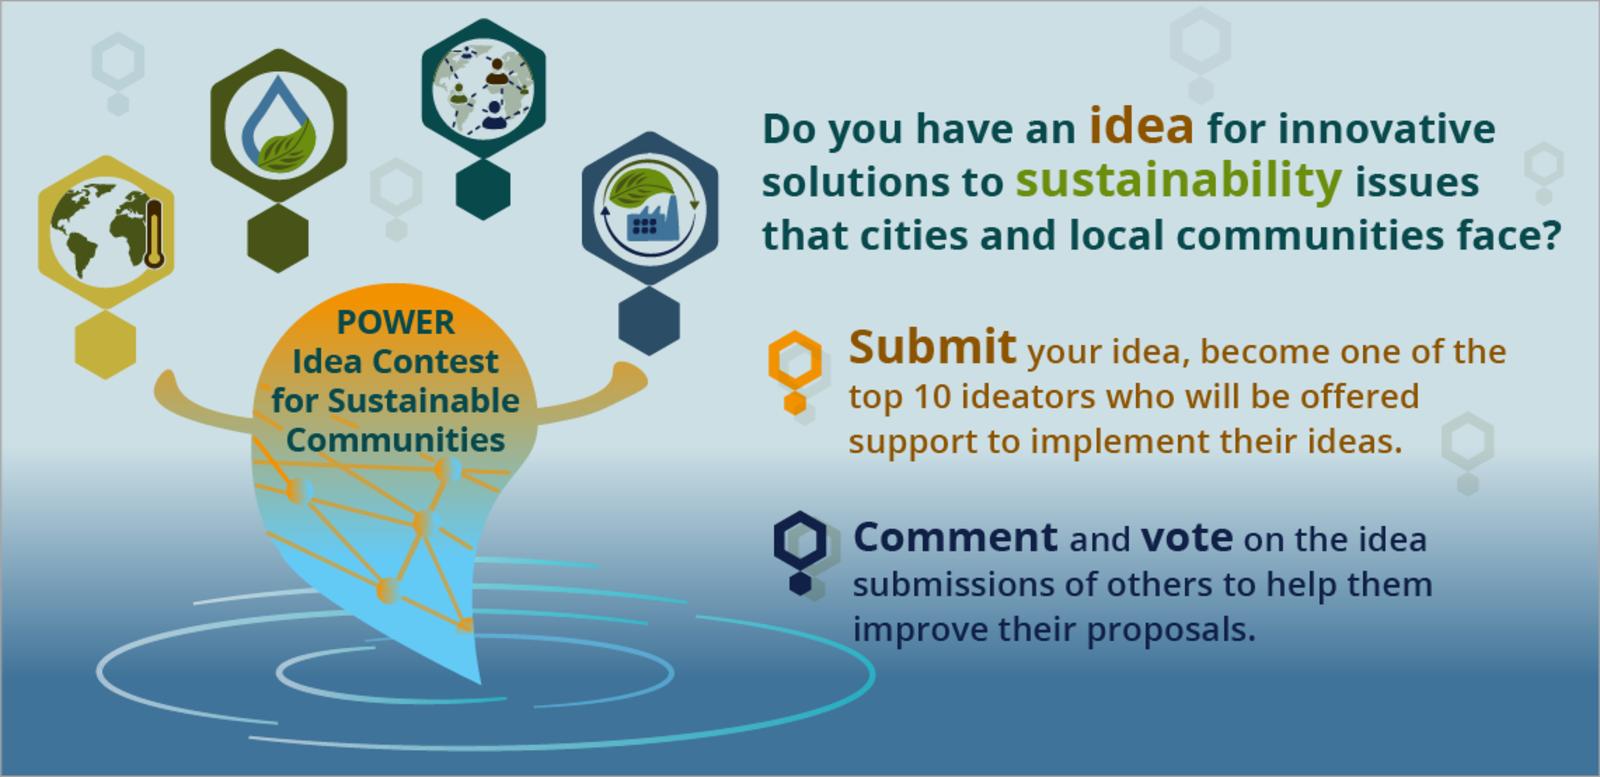 Aprende sobre el Concurso de Ideas POWER para Comunitats Sostenibles